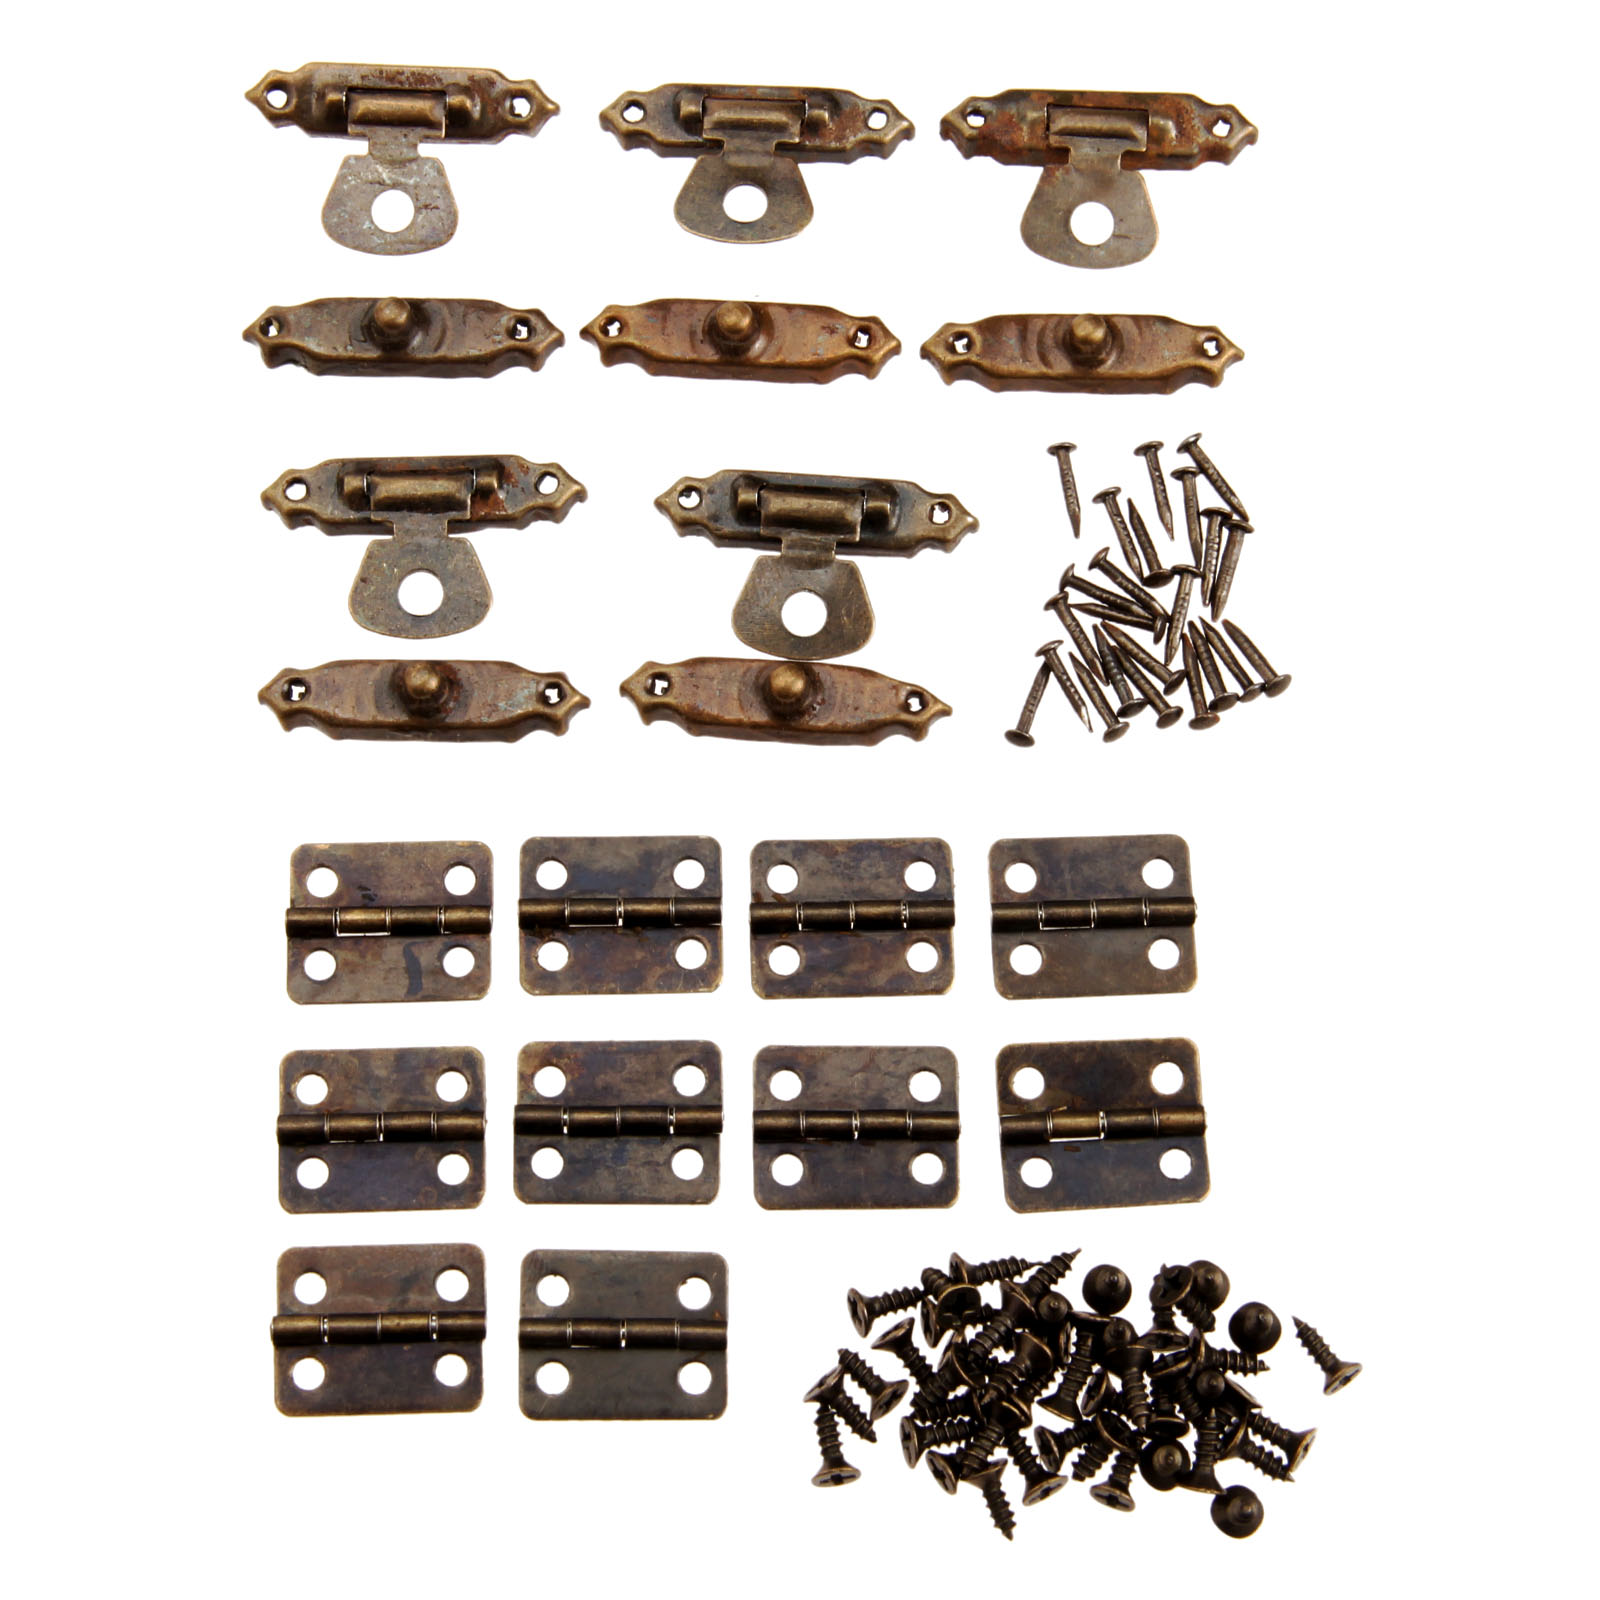 10Pcs 16*13mm Antique Bronze Furniture Cabinet Hinges + 5Pcs 26*15mm Jewelry Wood Box Toggle Hasp Latch Lock Furniture Hardware